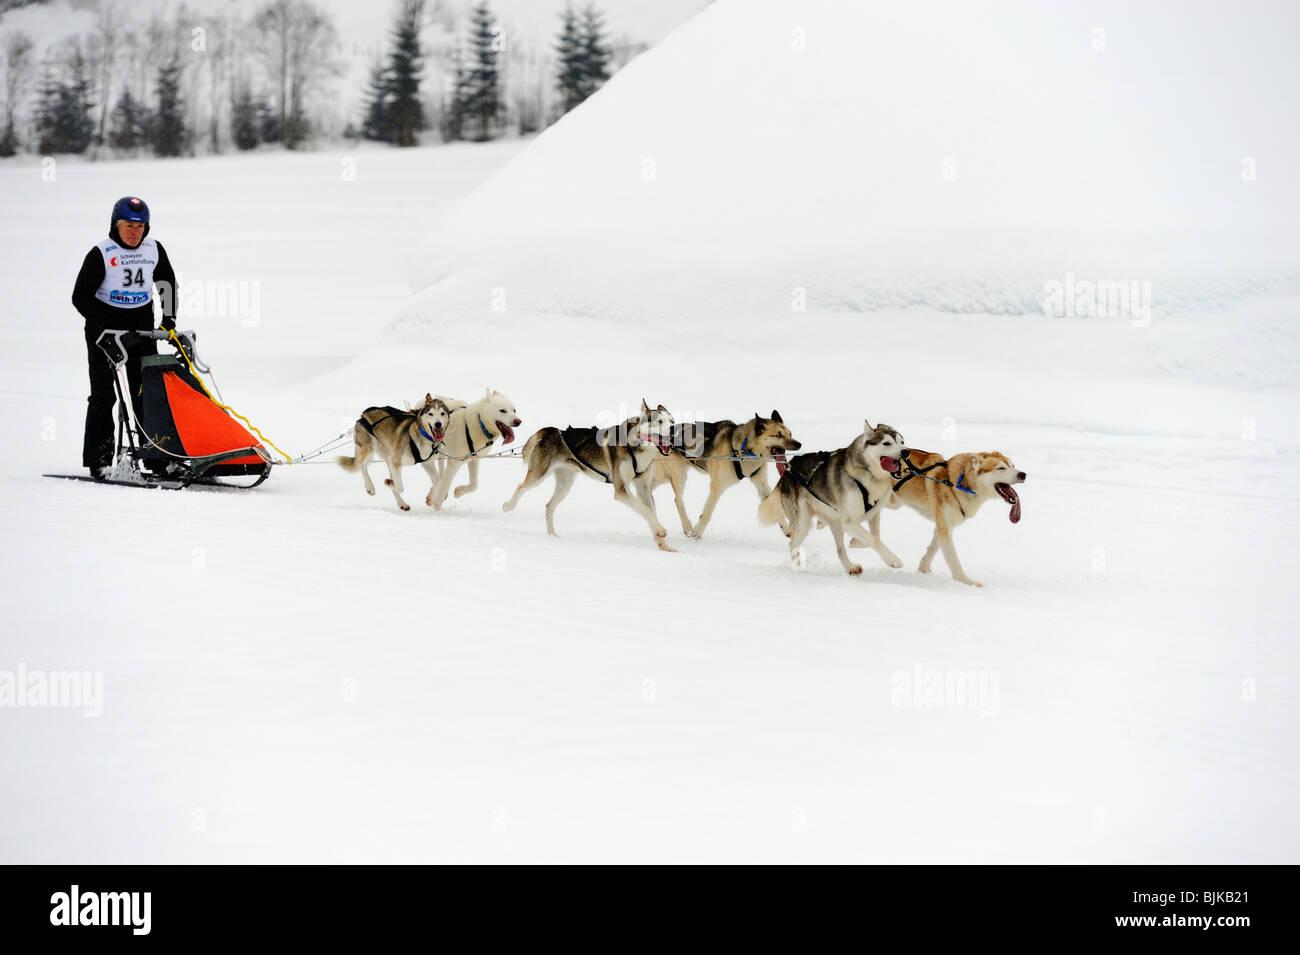 Siberian Husky, sled dog team with musher, Studen, Switzerland, Europe - Stock Image